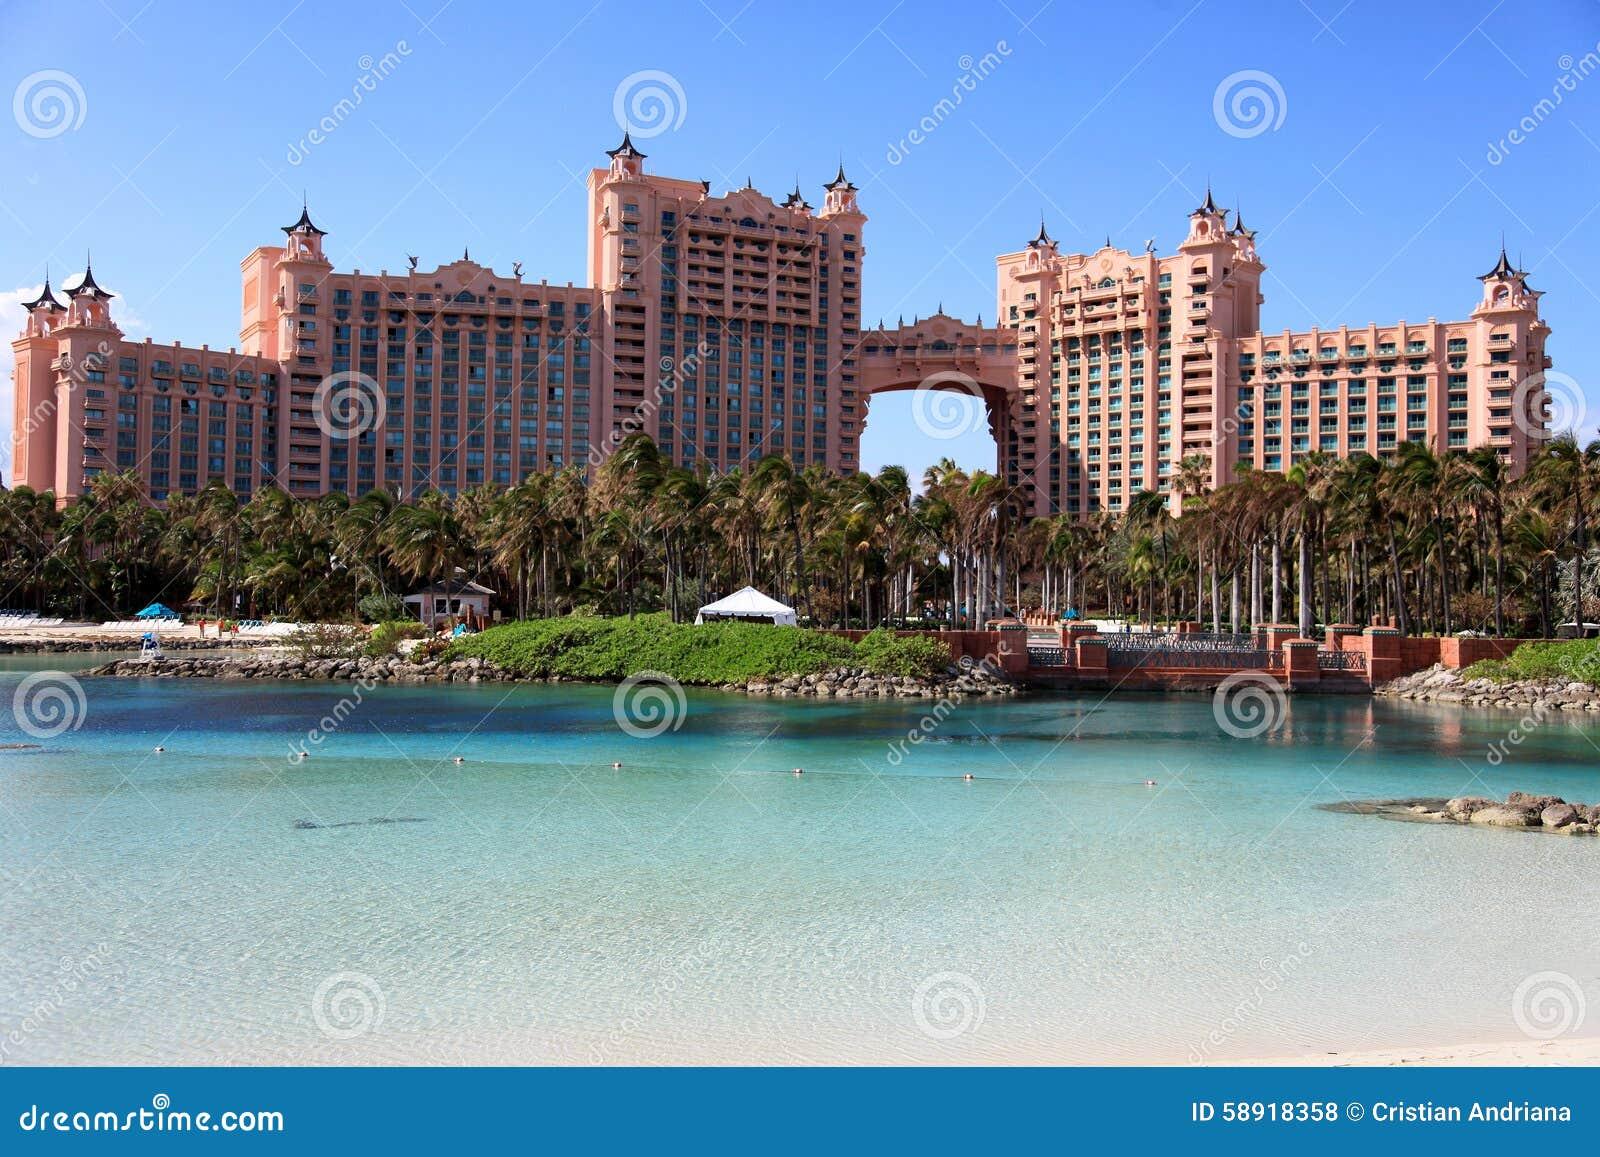 Sun, blue sky and puffy clouds at Atlantis hotel, Paradise Island, Bahamas